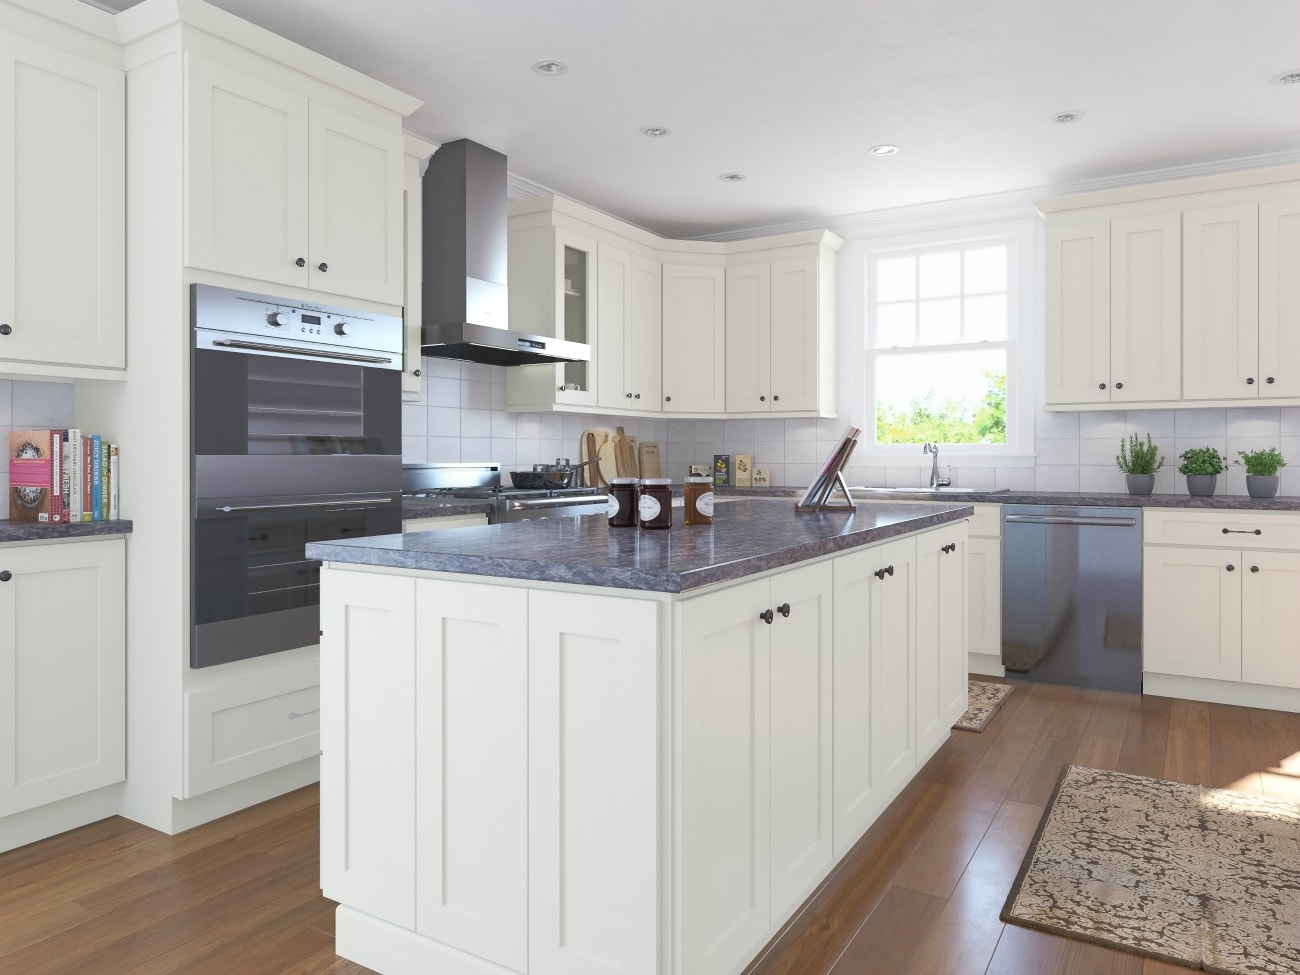 Linen Shaker RTA Kitchen Cabinets